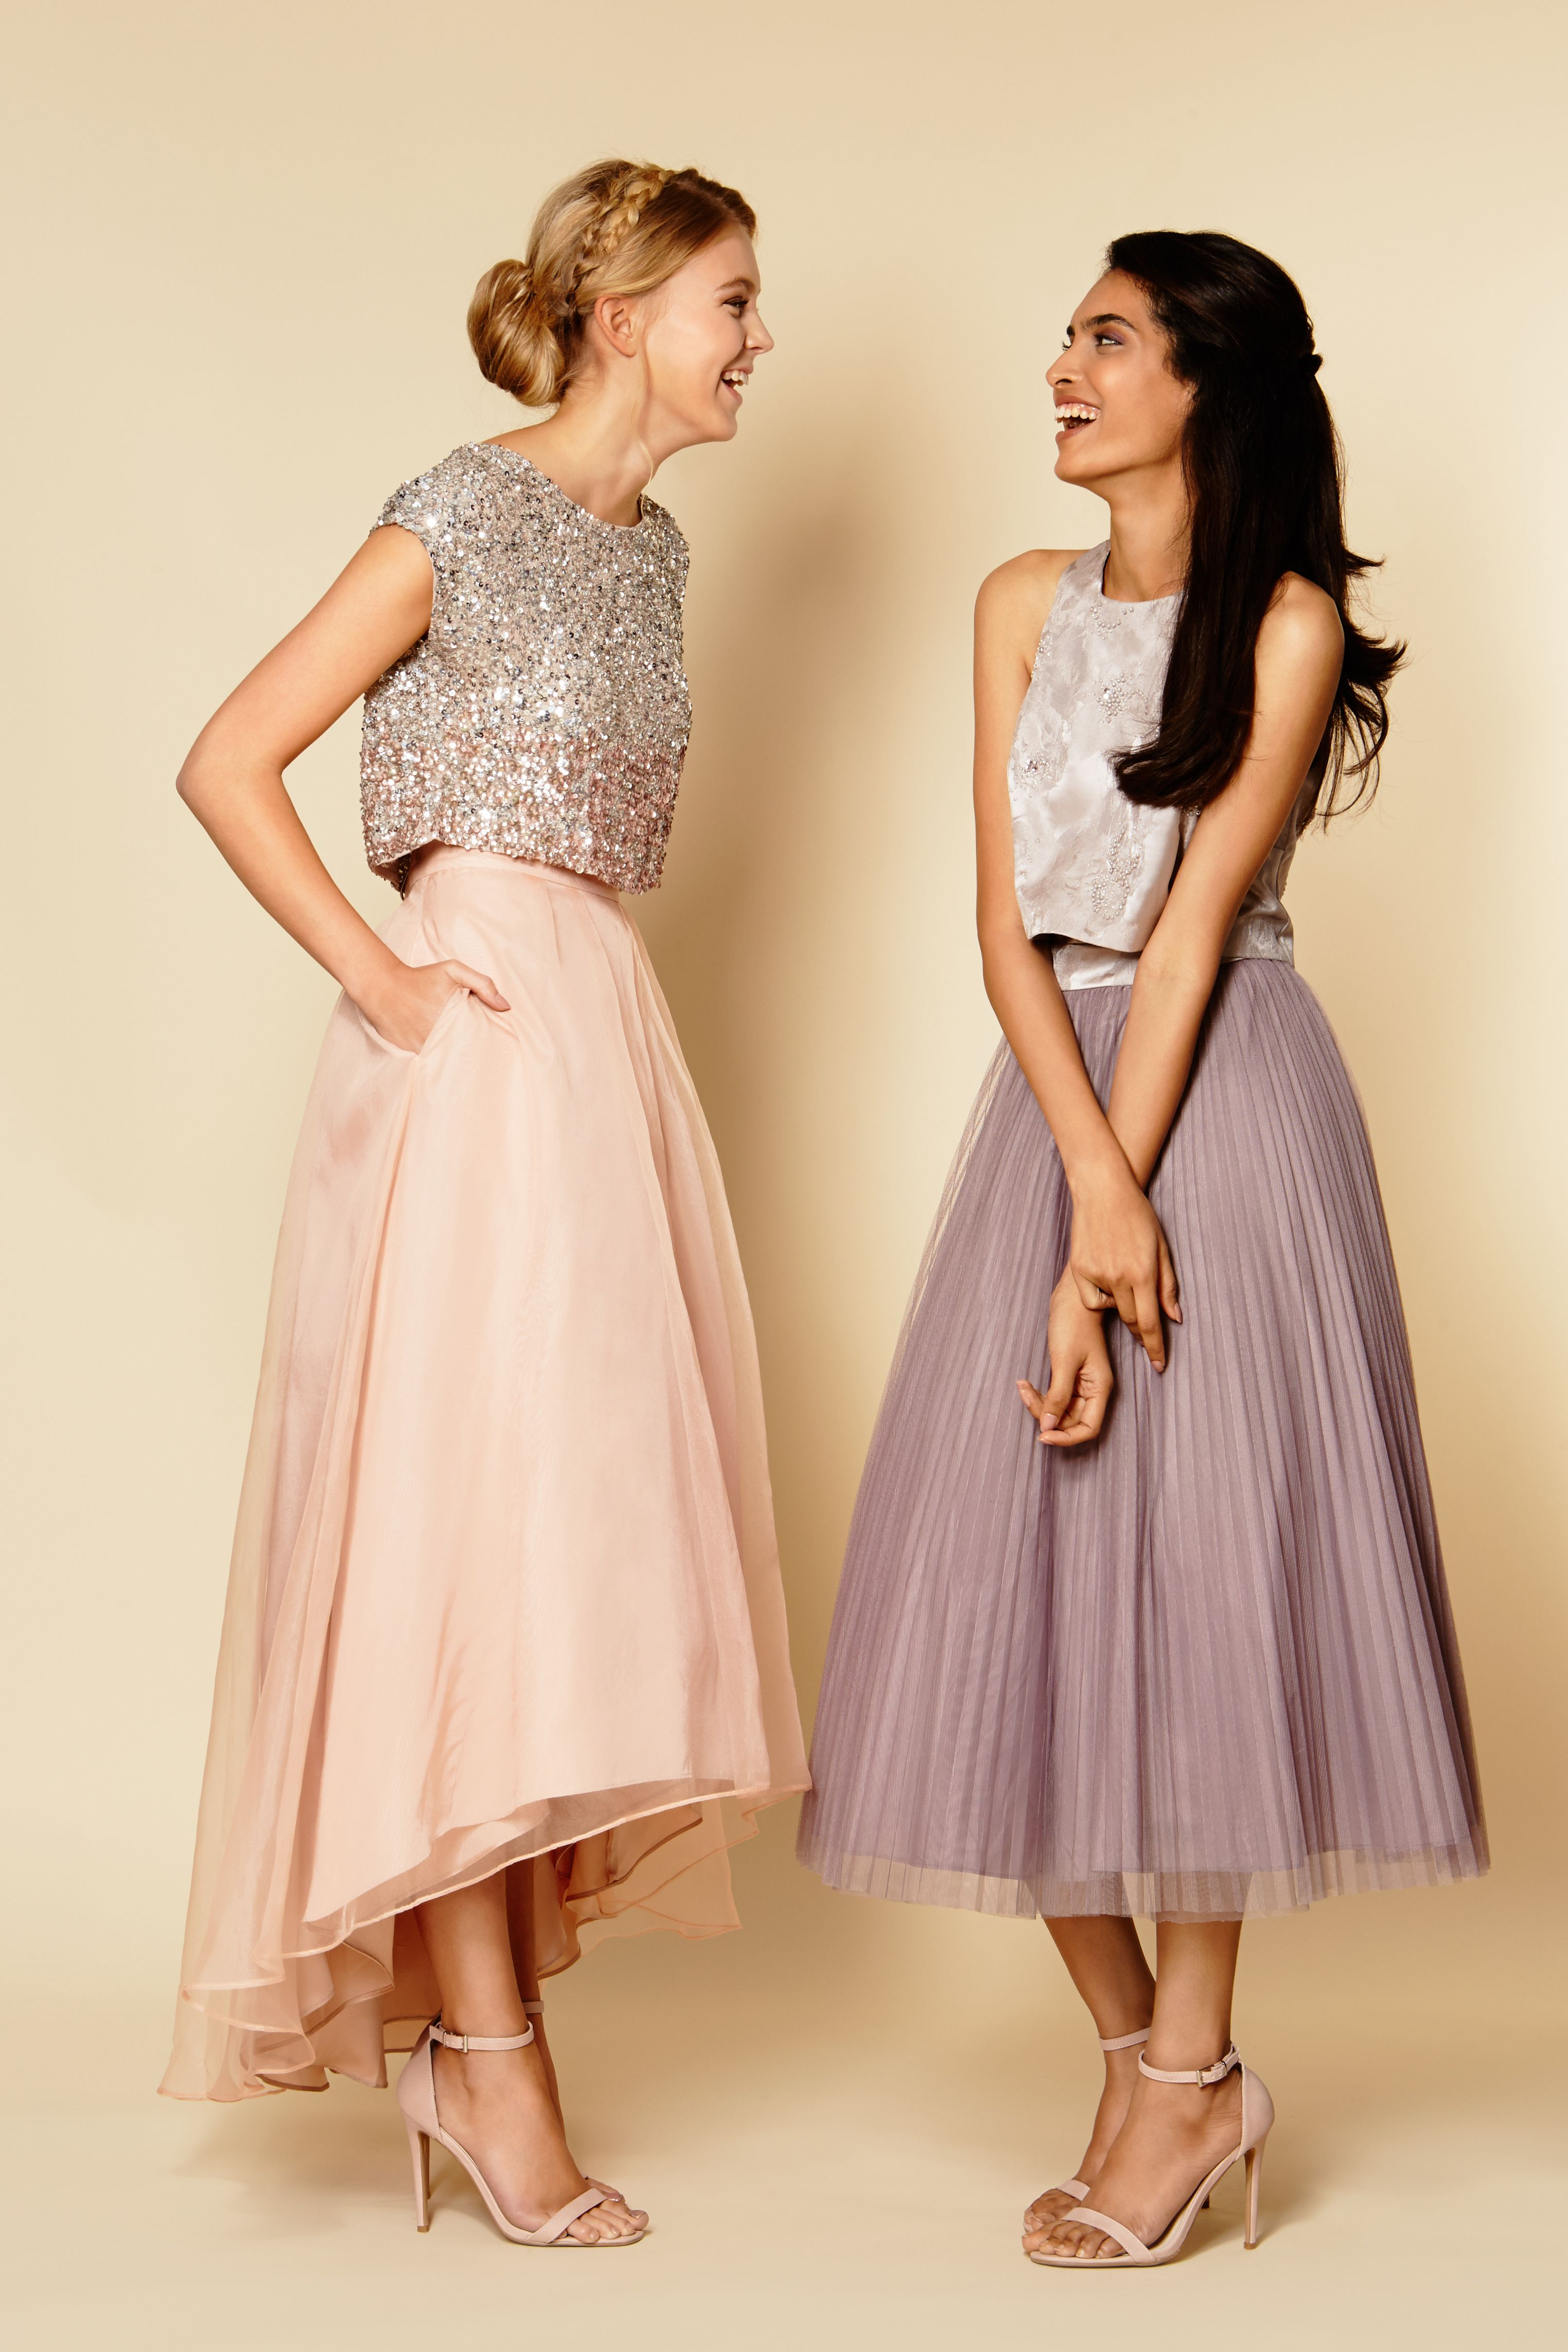 Harven dress and iridesa top and skirt wedding